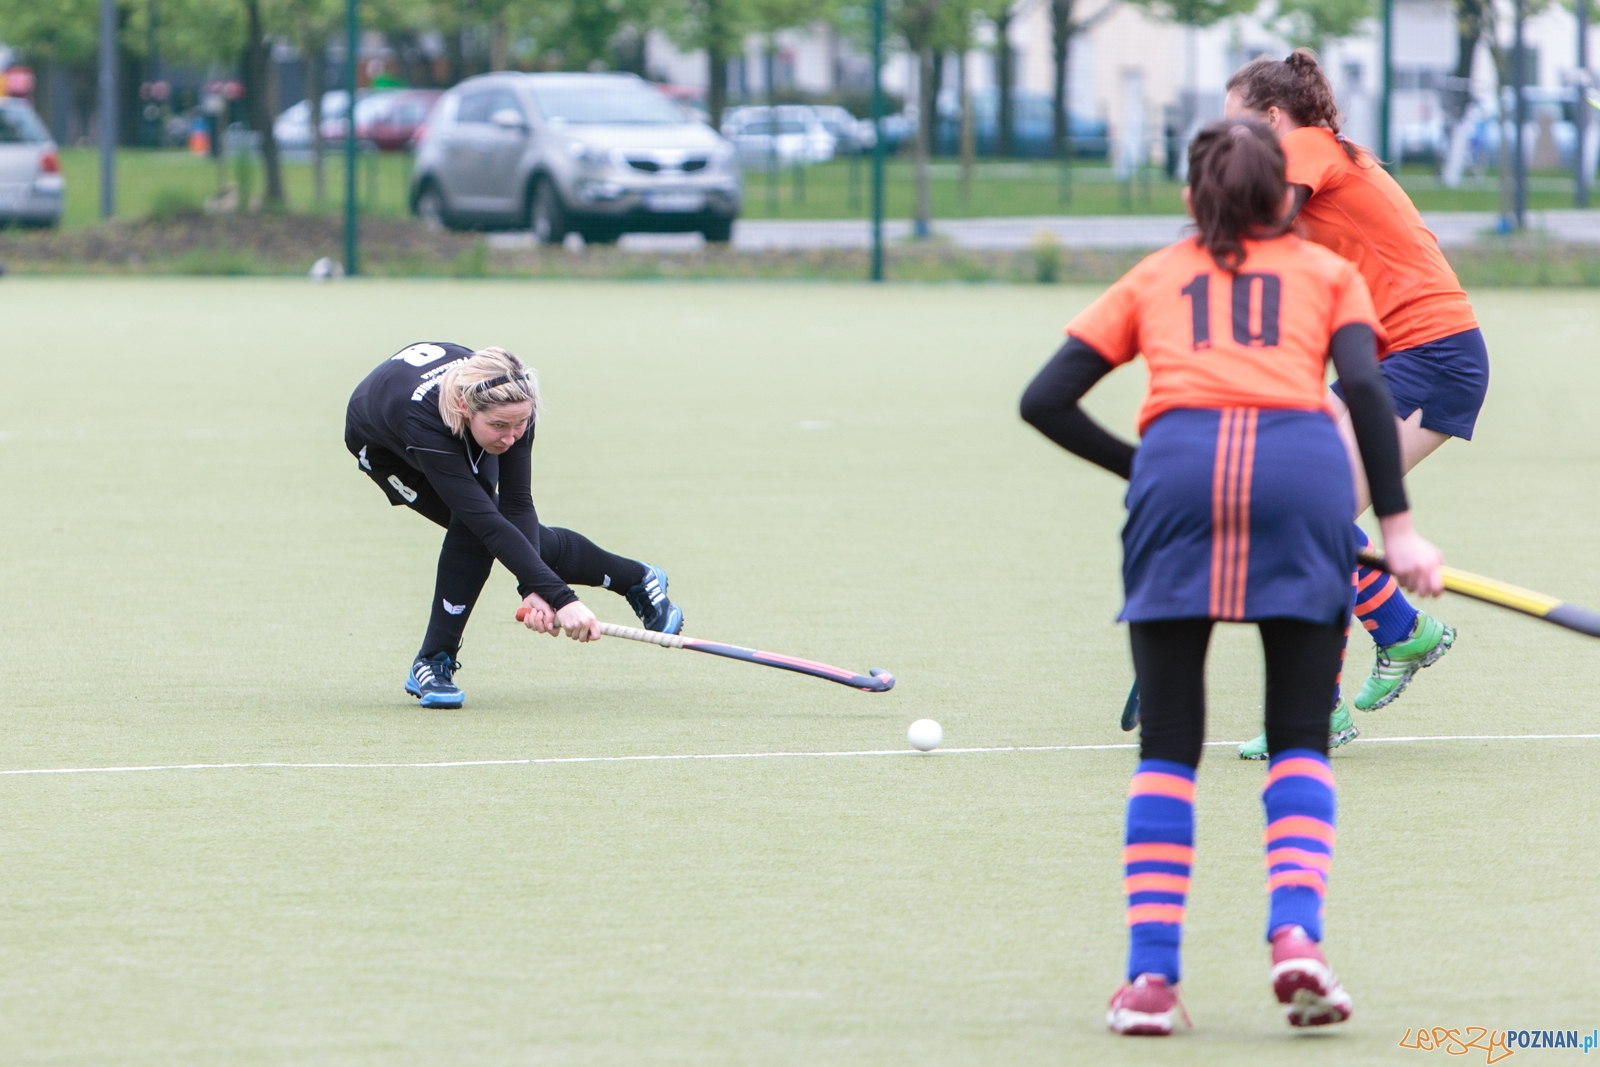 AZS Politechnika Poznańska - KS Hokej-Start-Brzeziny 0-0 (k.z.2  Foto: LepszyPOZNAN.pl / Paweł Rychter